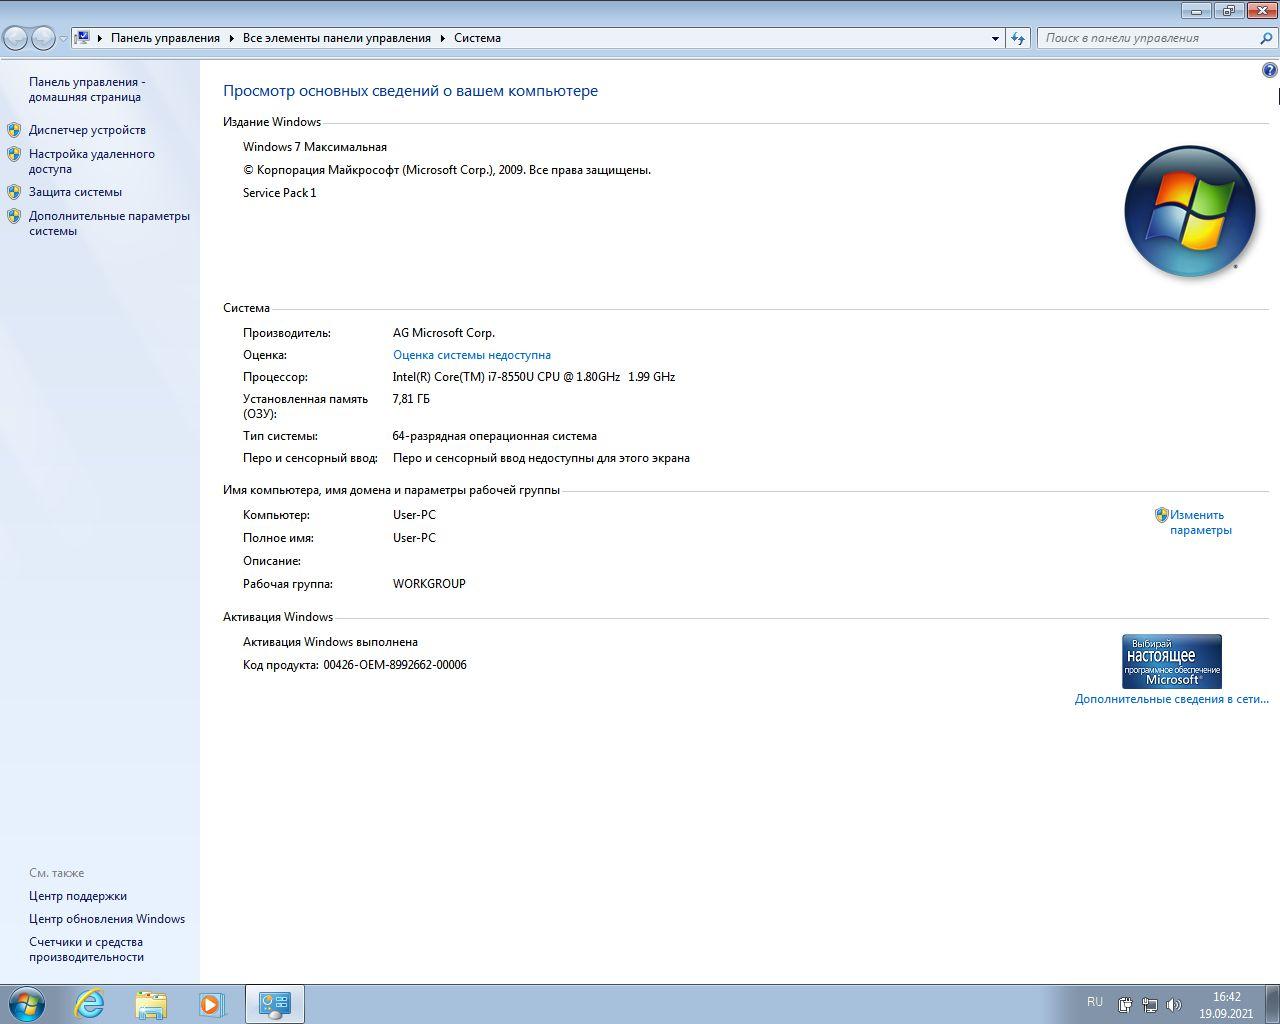 Windows 7 x64-x86 5in1 WPI & USB 3.0 + M.2 NVMe by AG 09.2021